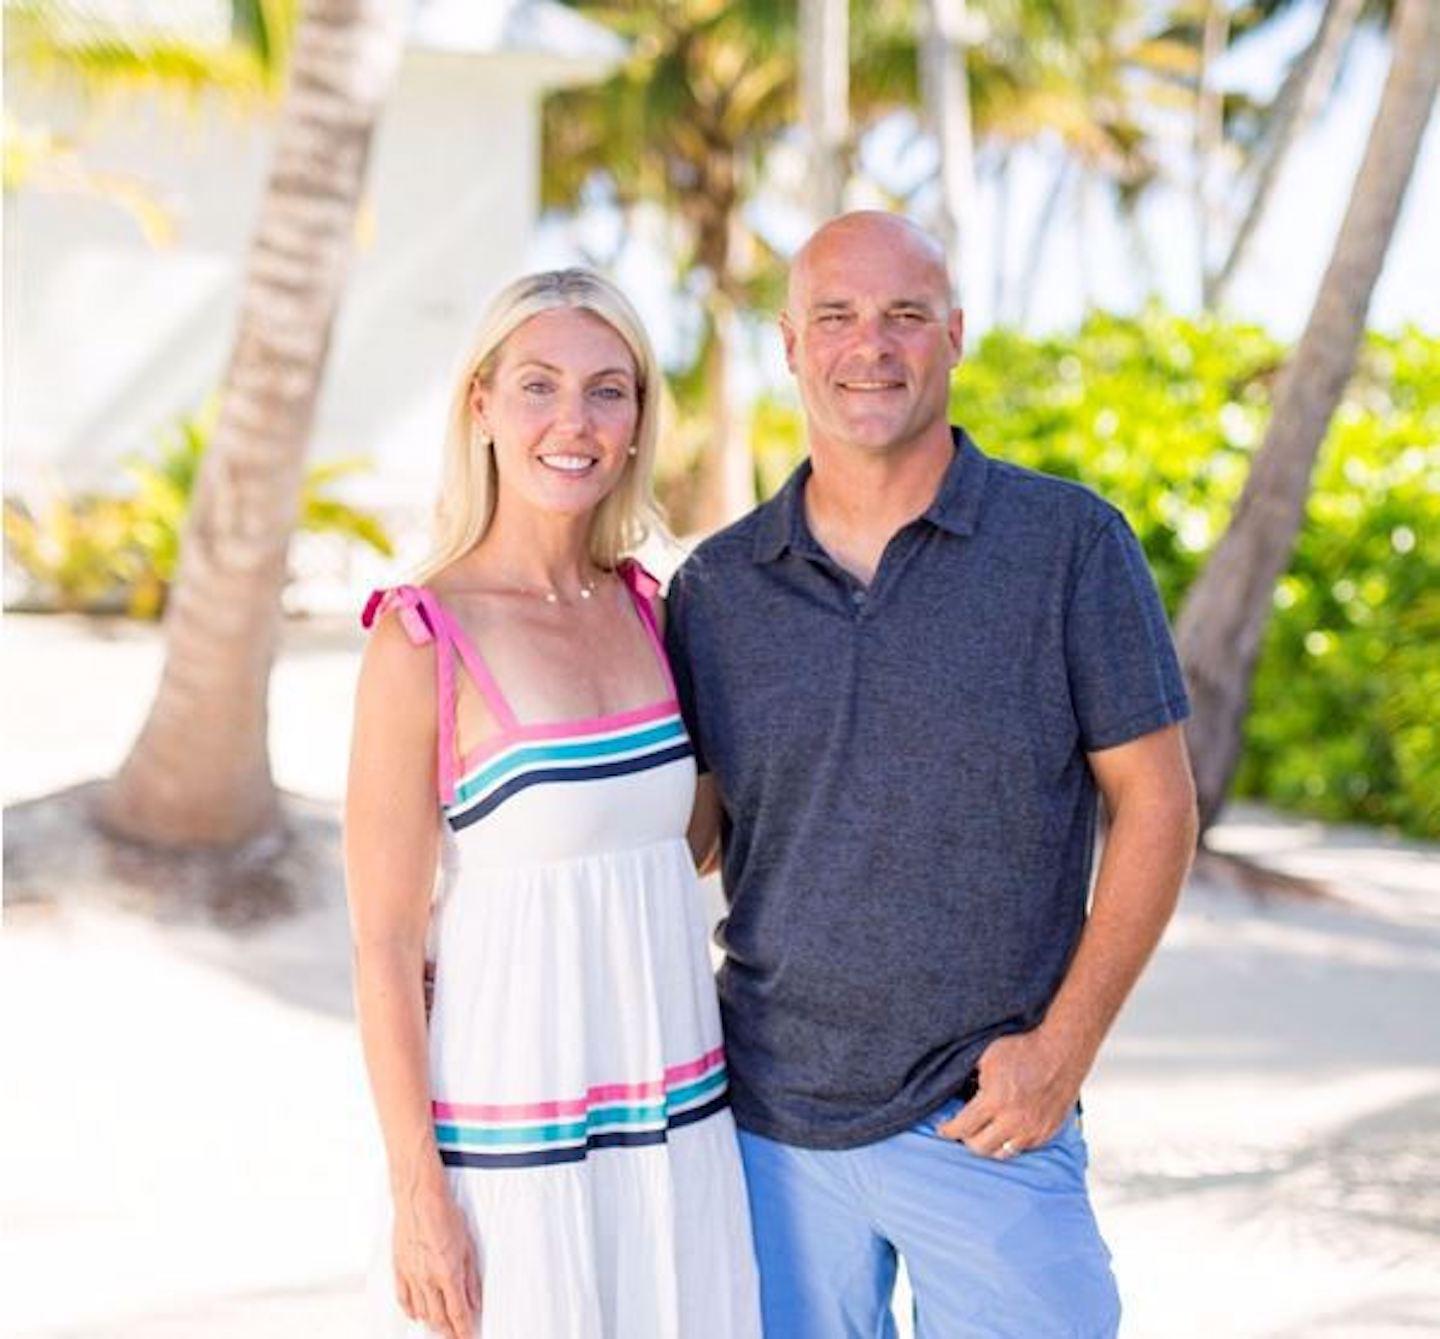 The Baeumler Family Runs A Hotel In A Pandemic In 'Island Of Bryan' Season 3